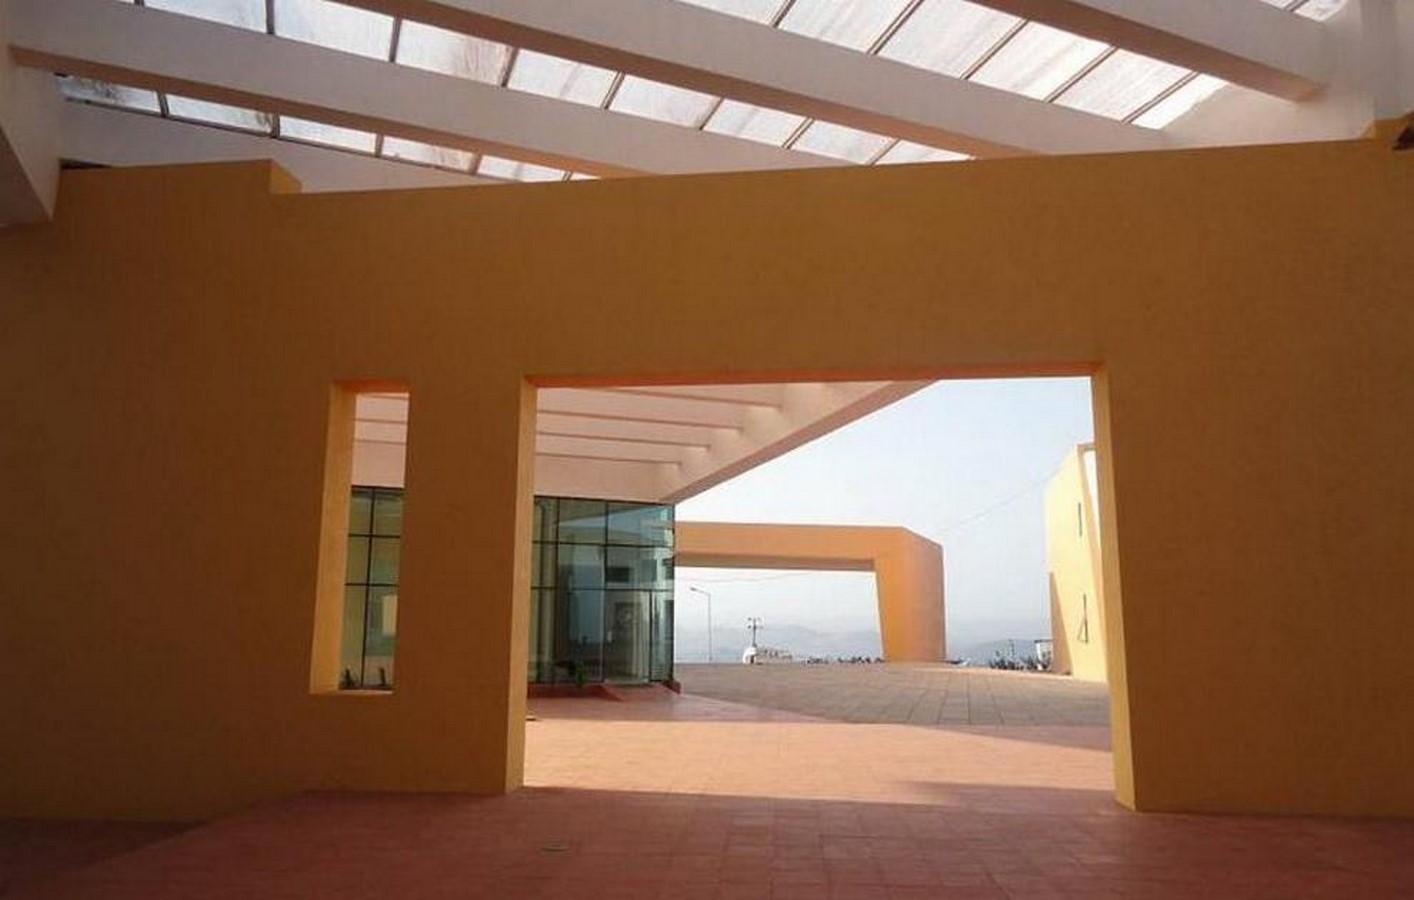 Goa institute of management by Brinda Somaya: Bridge between traditional and conventional design - Sheet4